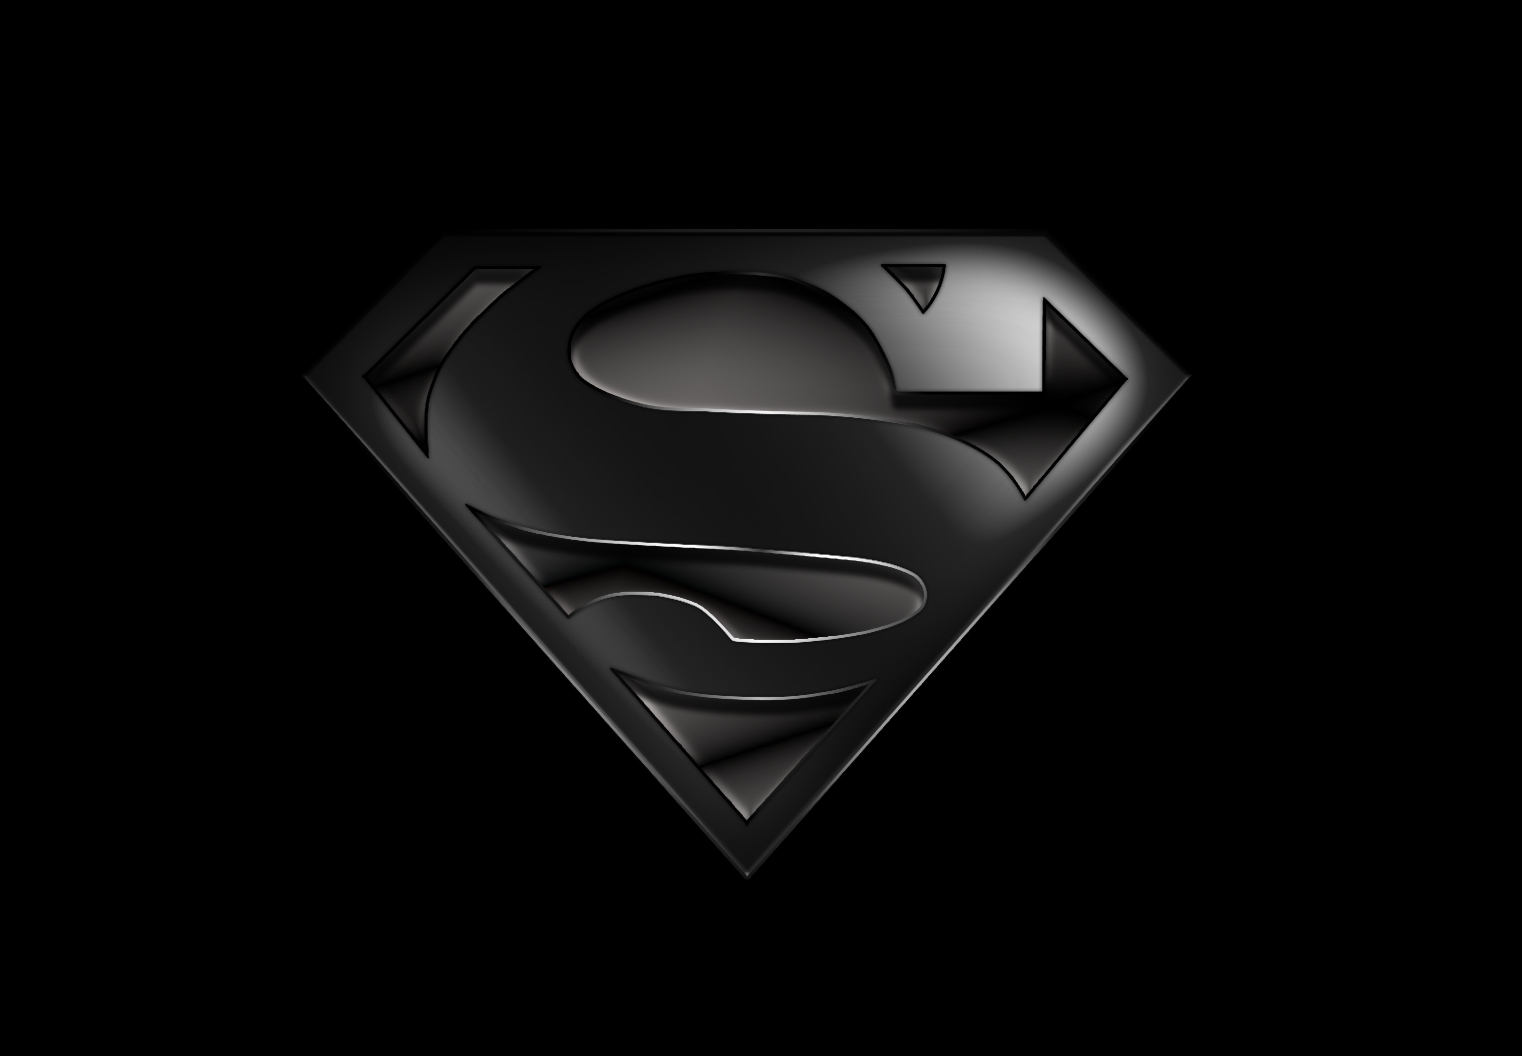 evil superman wallpaper hd - photo #23